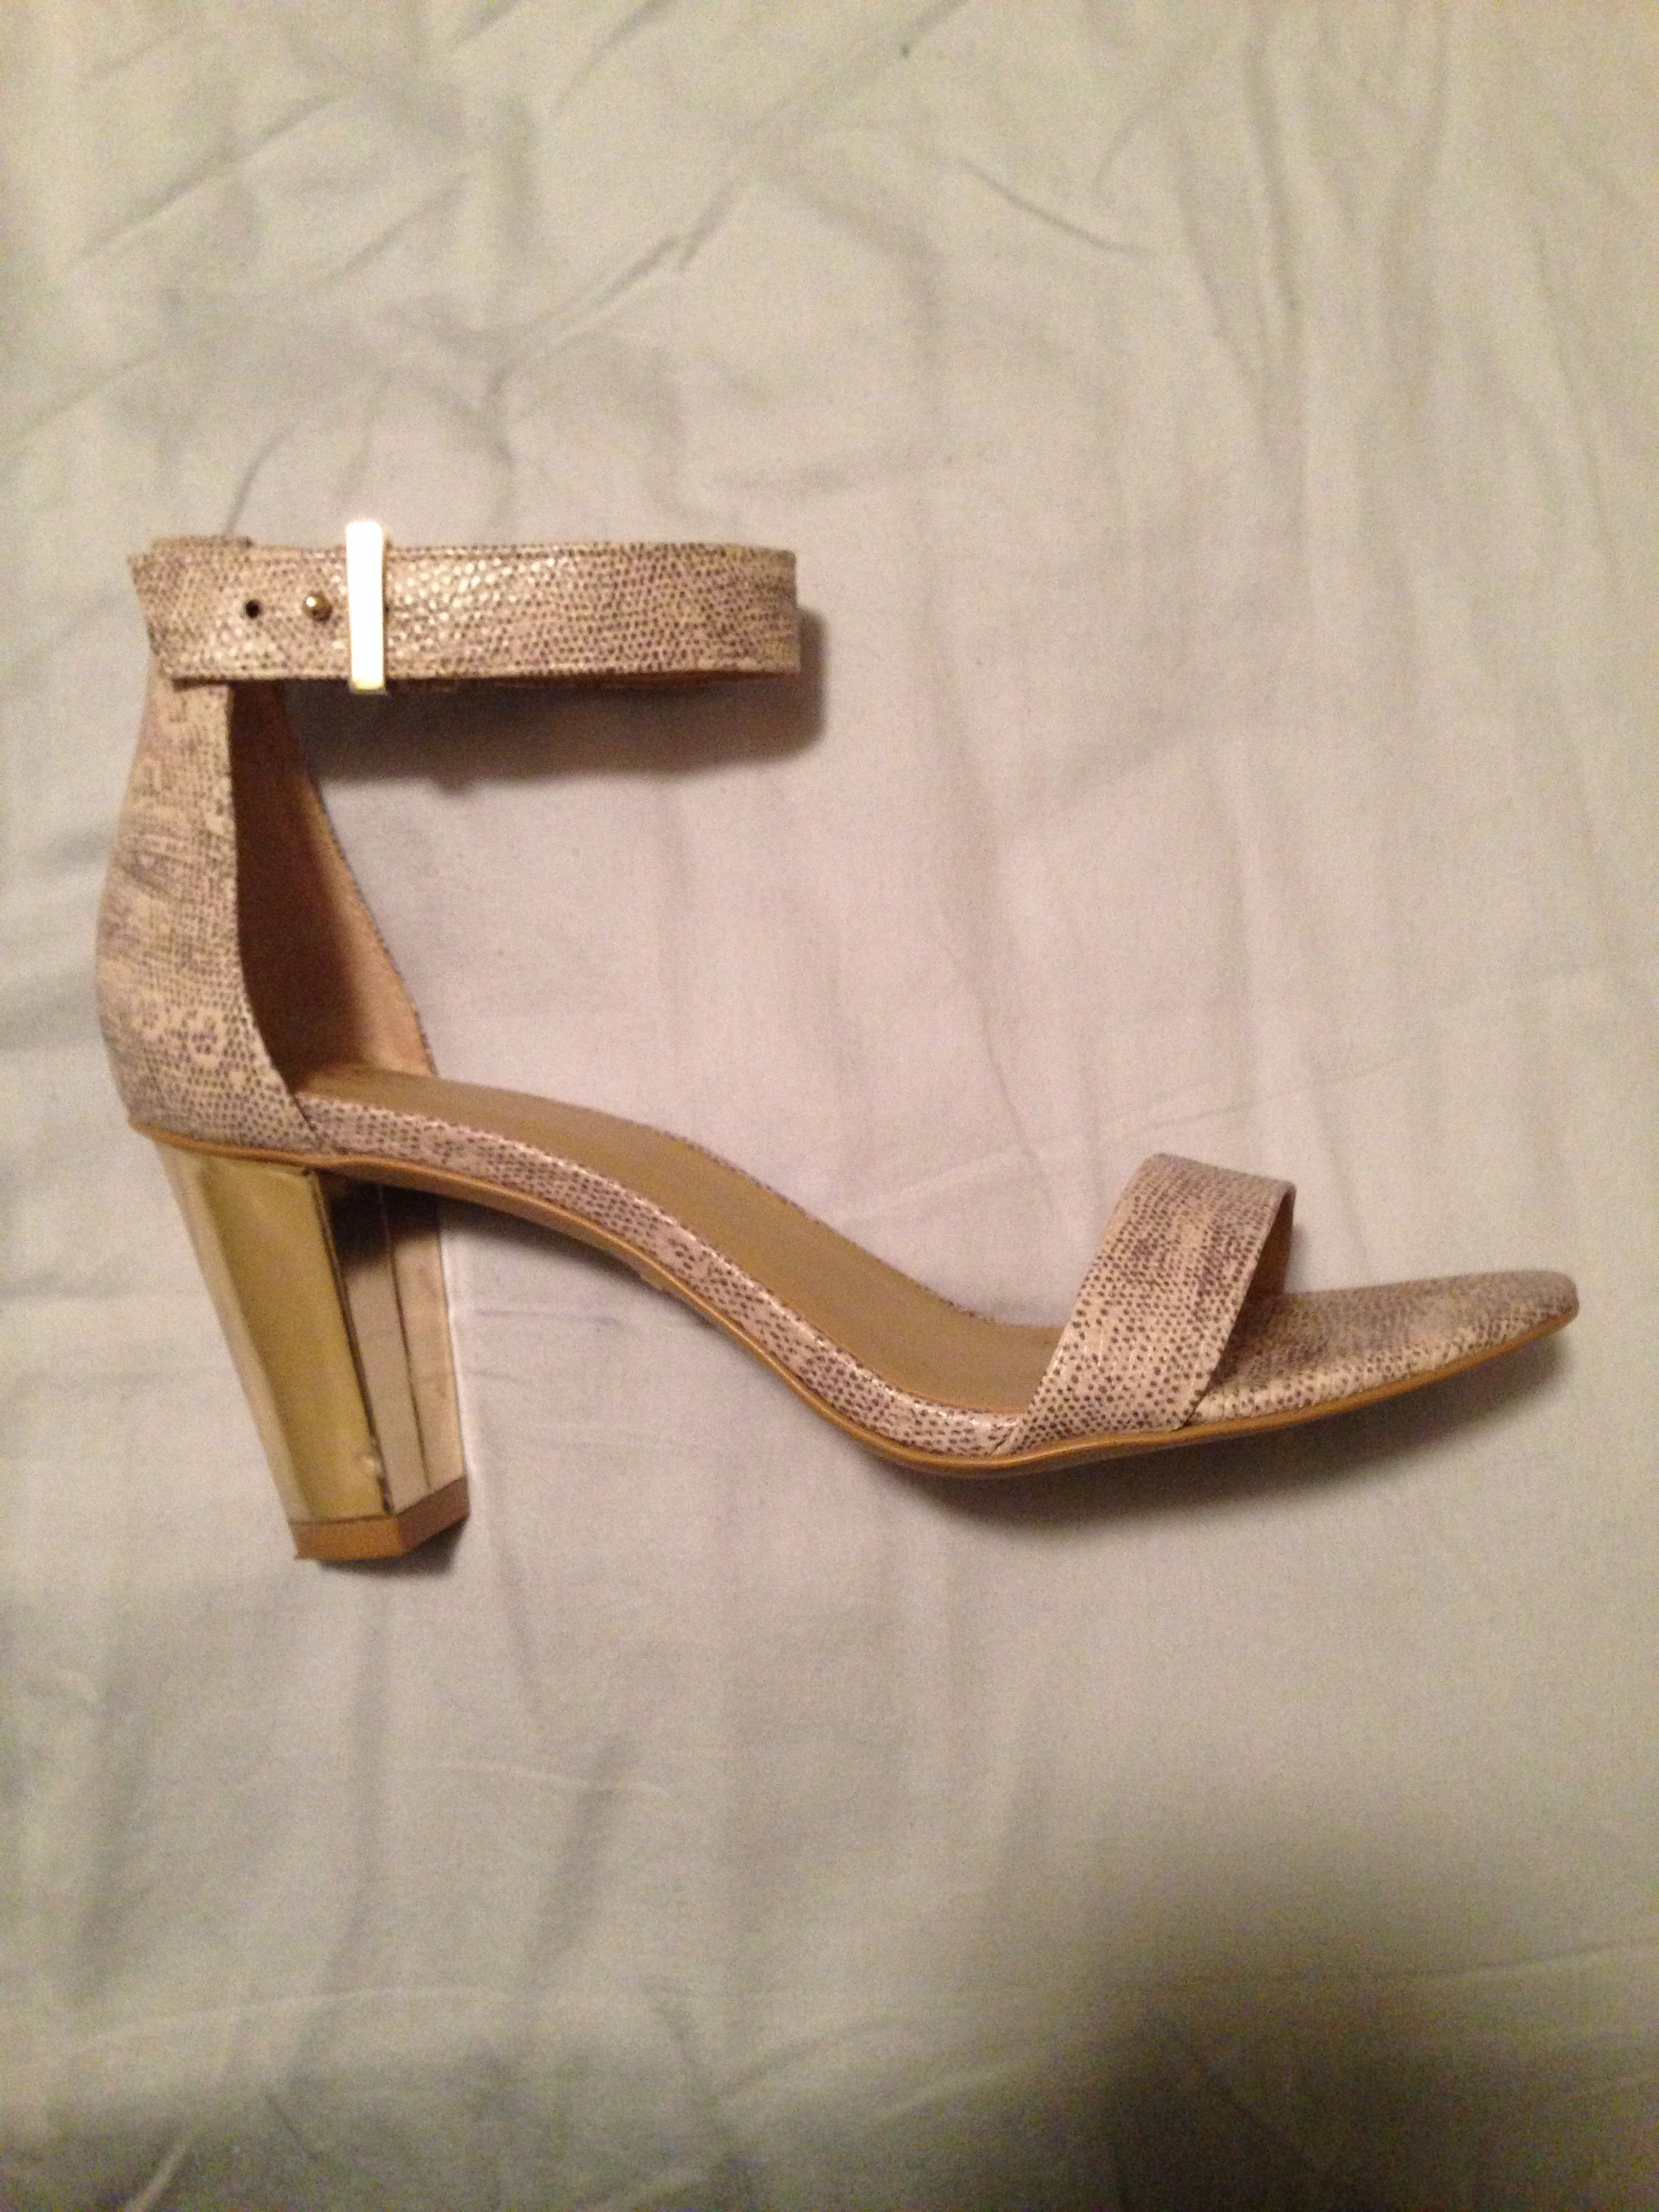 Cute Ann Taylor heels!